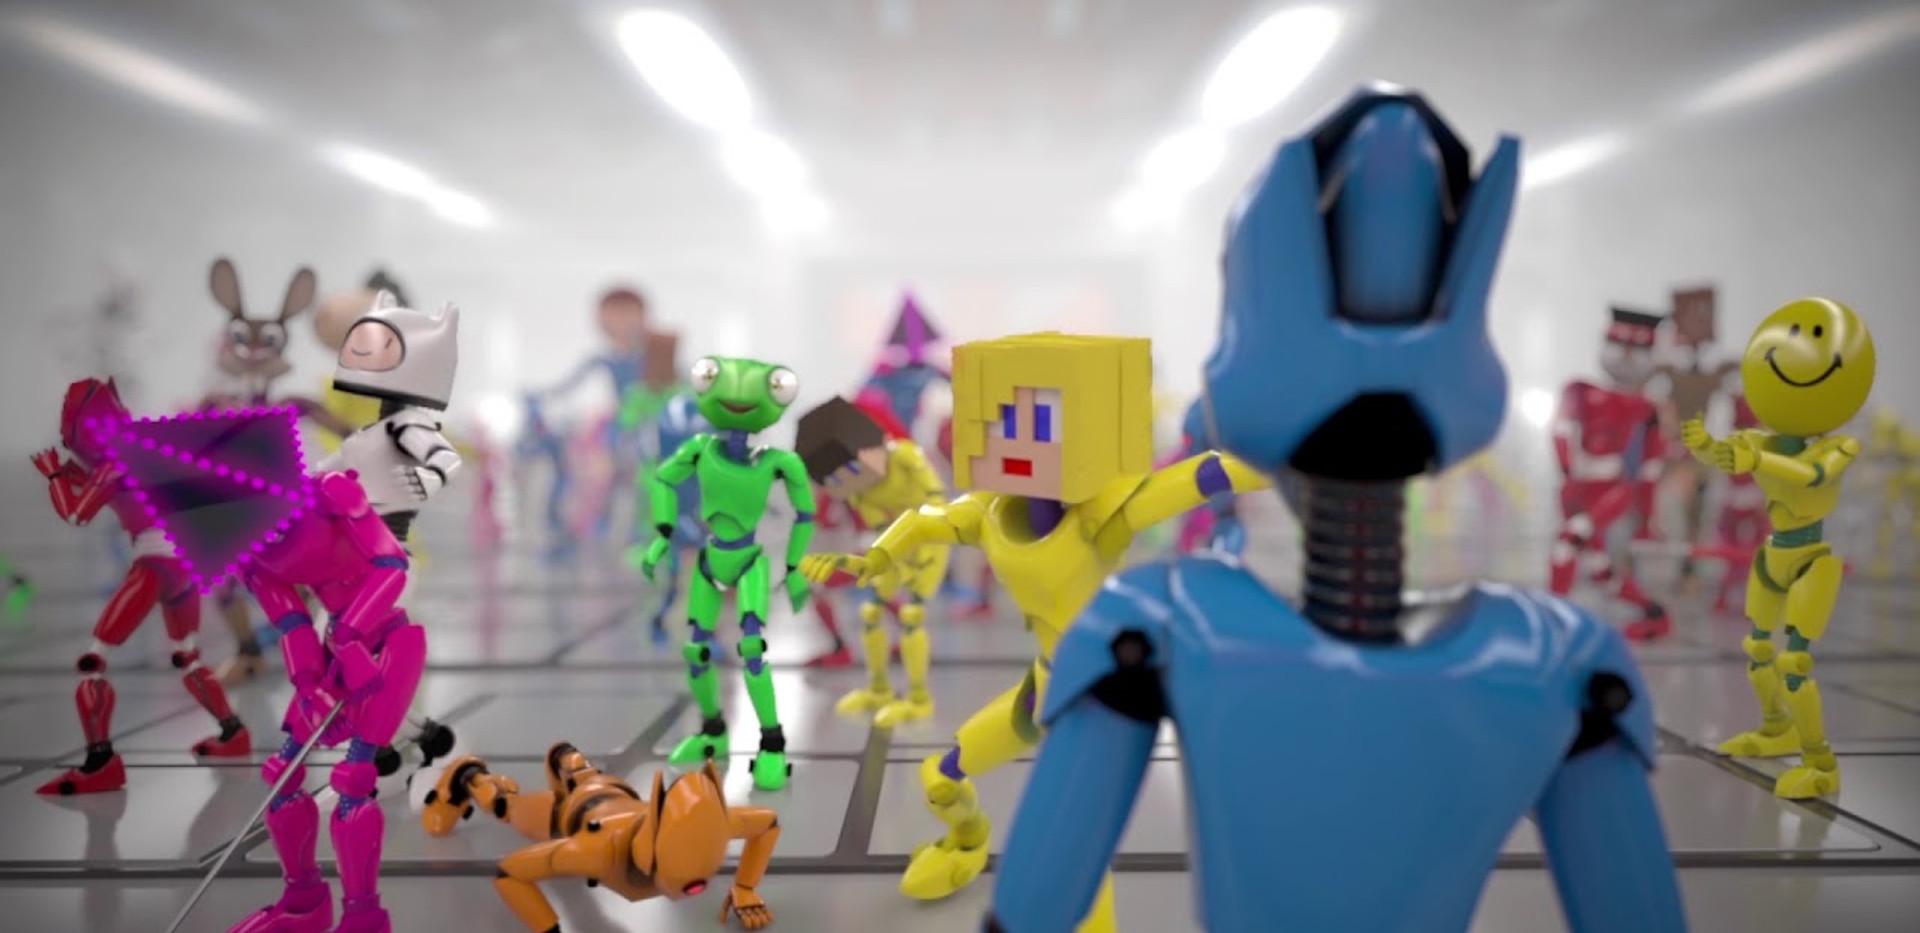 Holodeck VR Promo Video